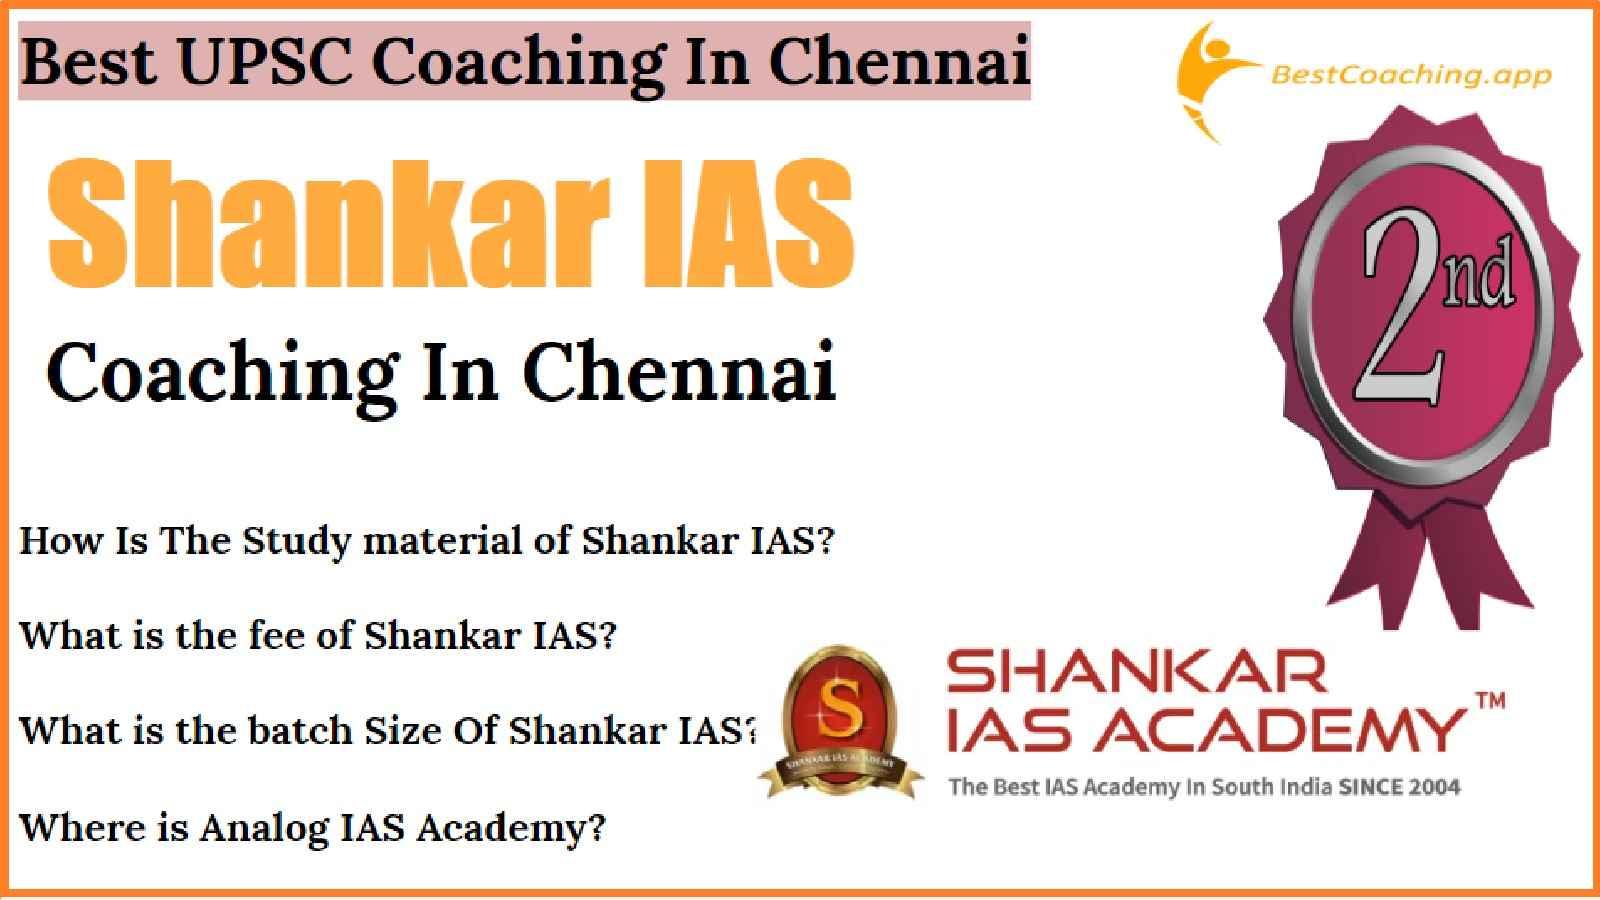 Top IAS Coaching Institute In Chennai